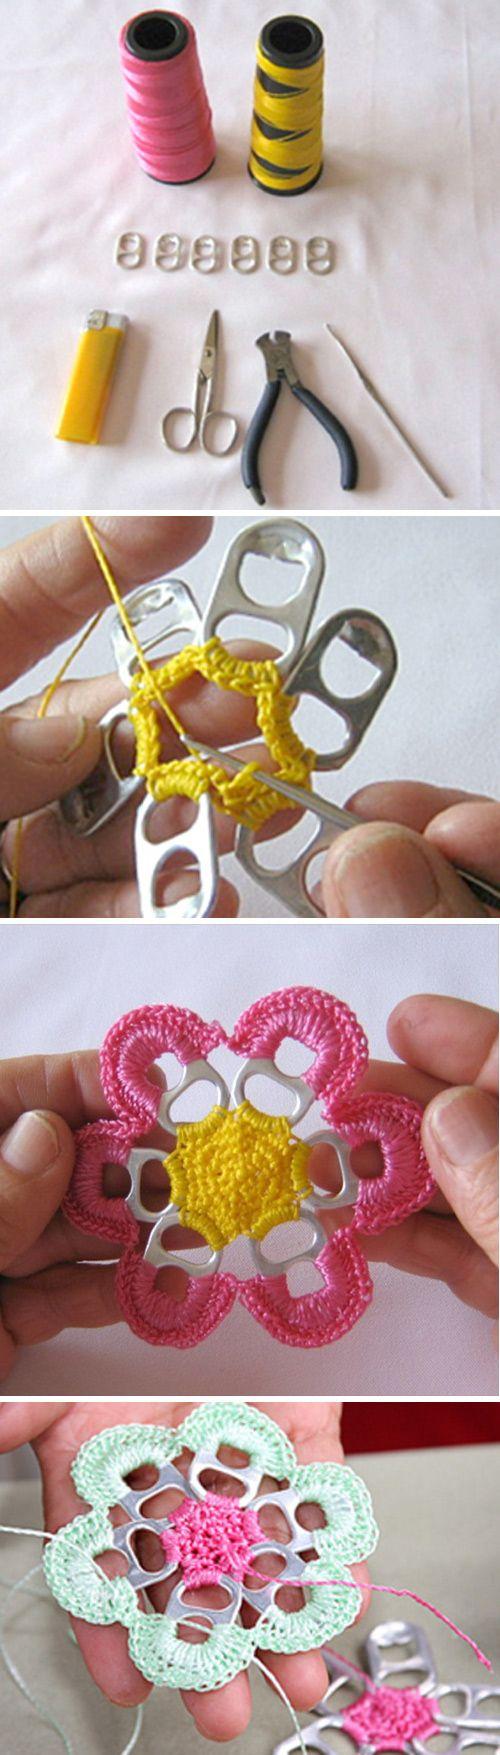 Pull Tabs Crochet Flowers